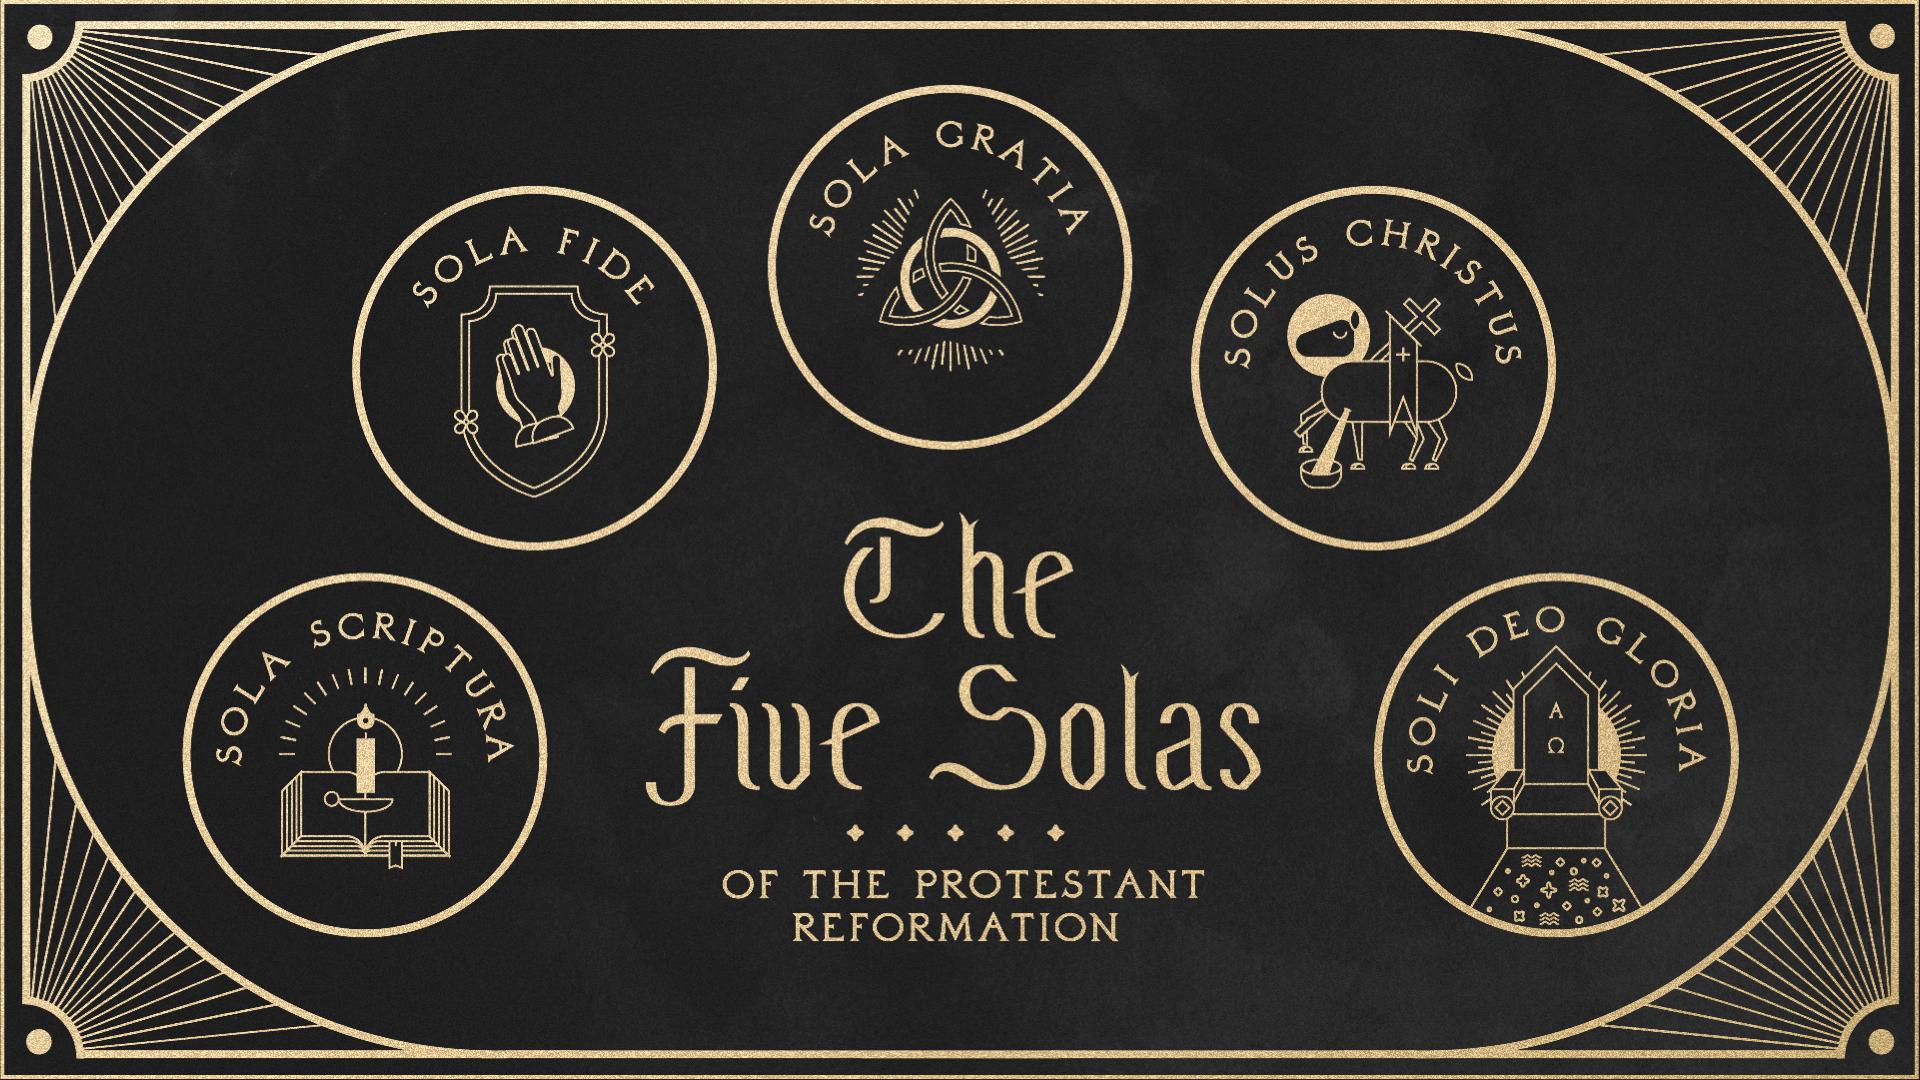 Five Solas INTRO JACK MOBILE 6:30:19.001.jpeg